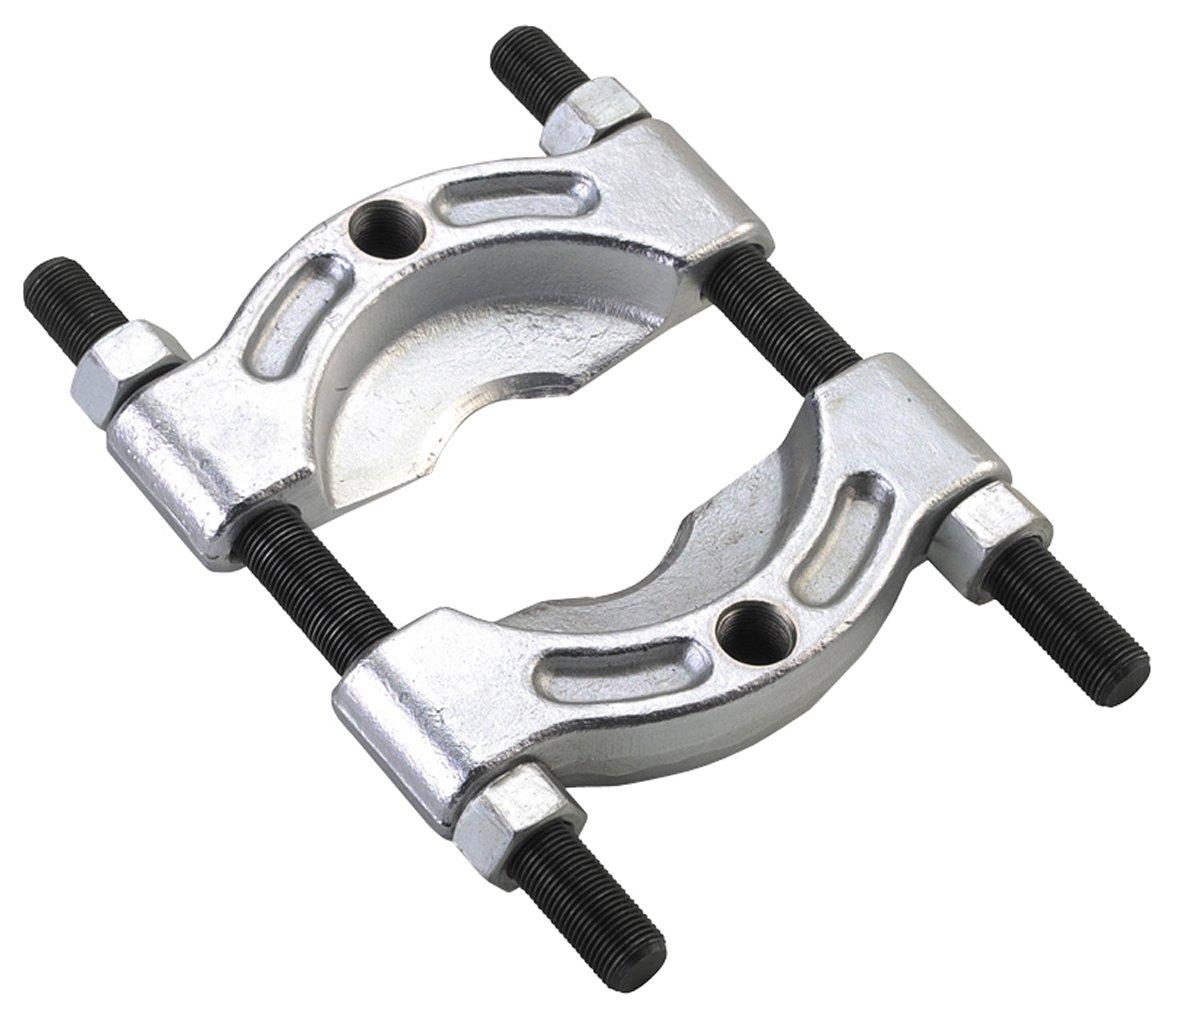 Sunex 57BS5 1//2 to 9 Bearing Splitter